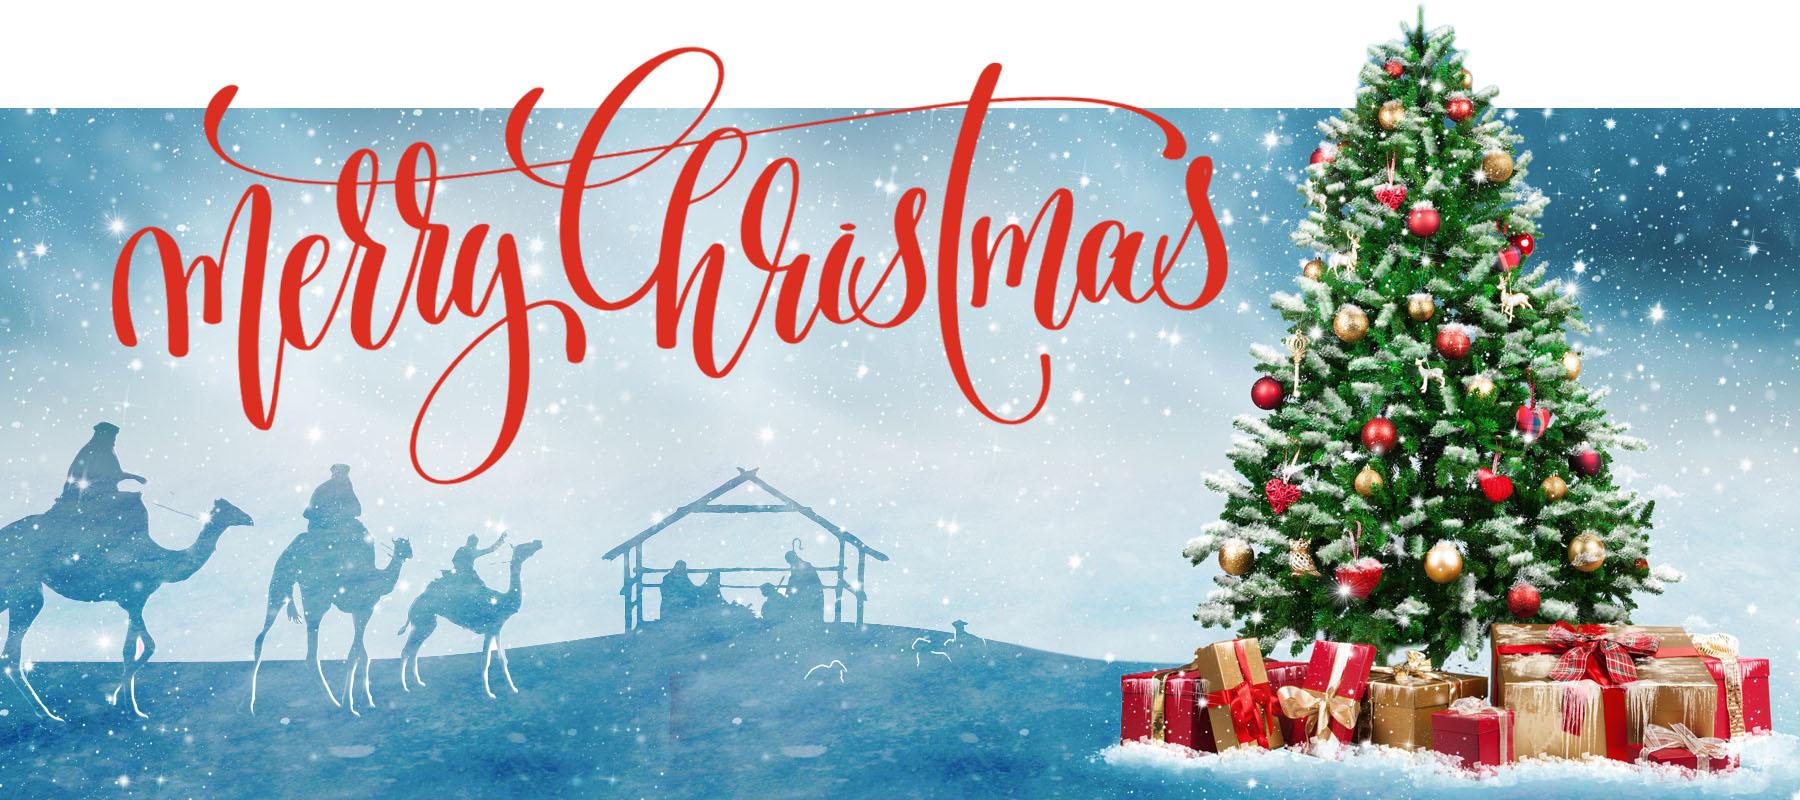 christmas-heading-graphic2